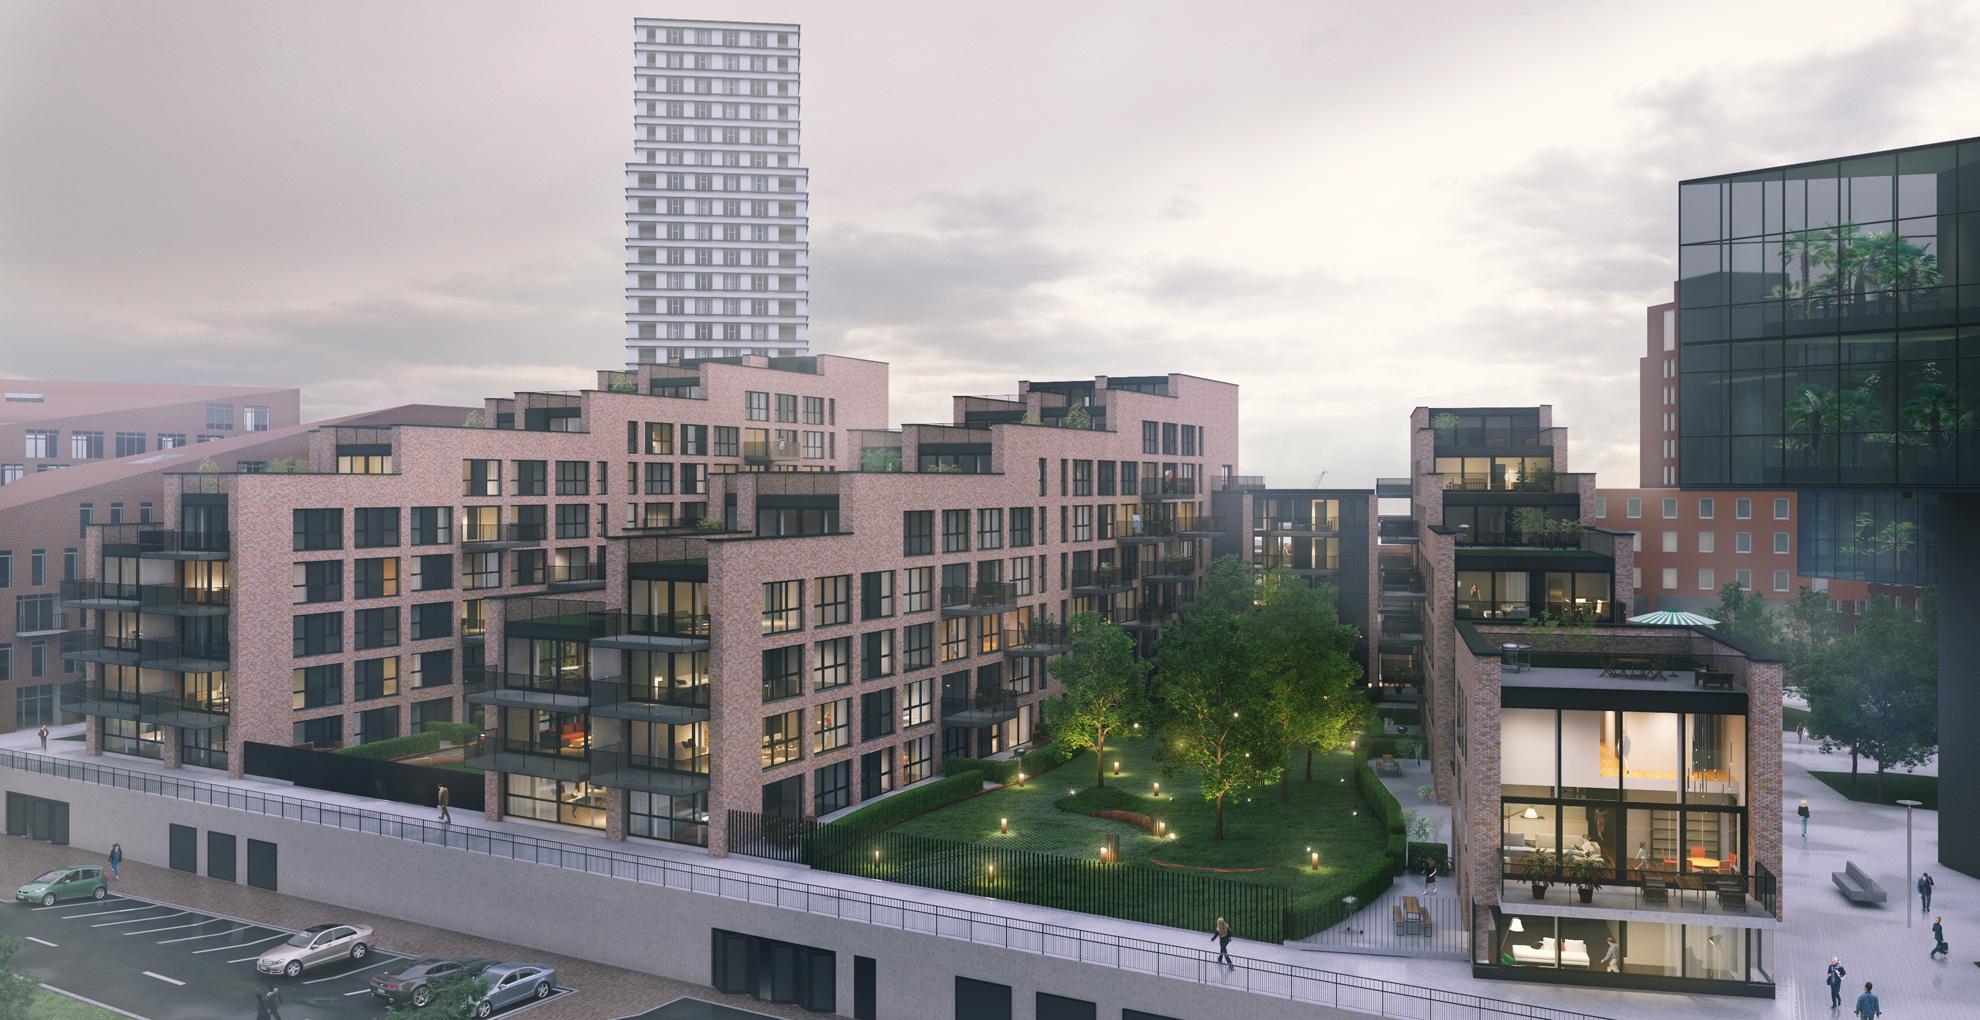 Belvédère apartments, 's-Hertogenbosch